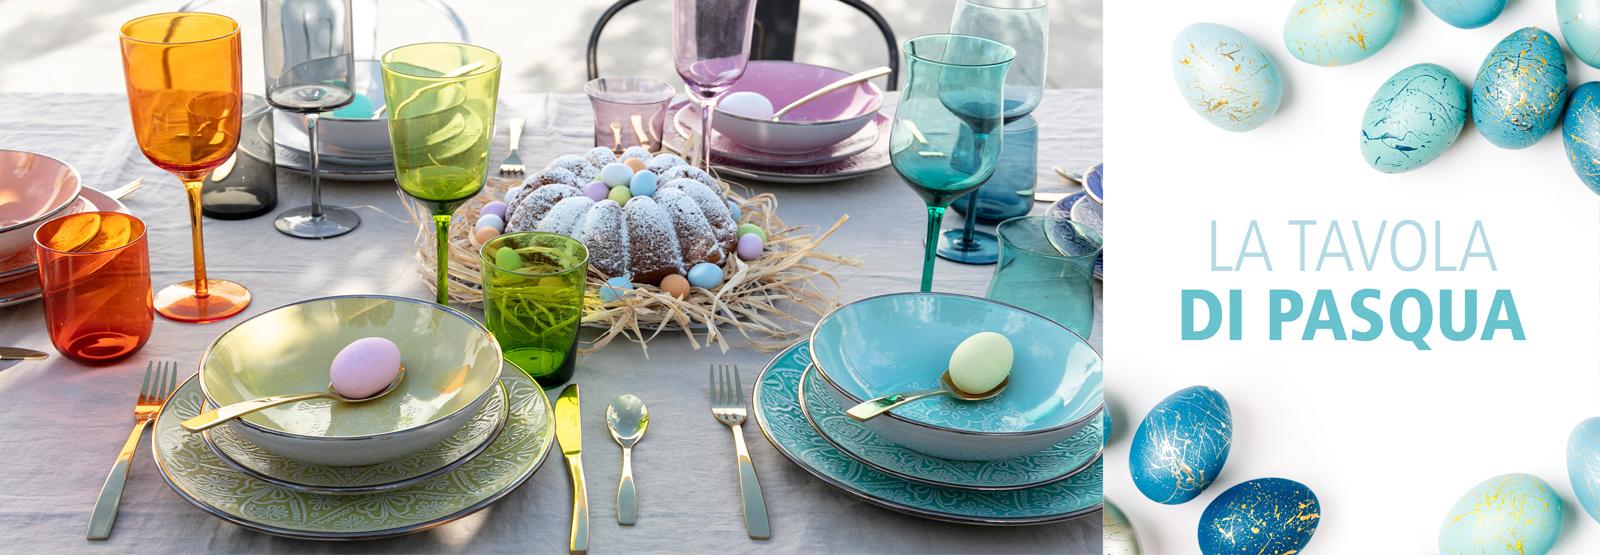 Tavola Pasqua piatti